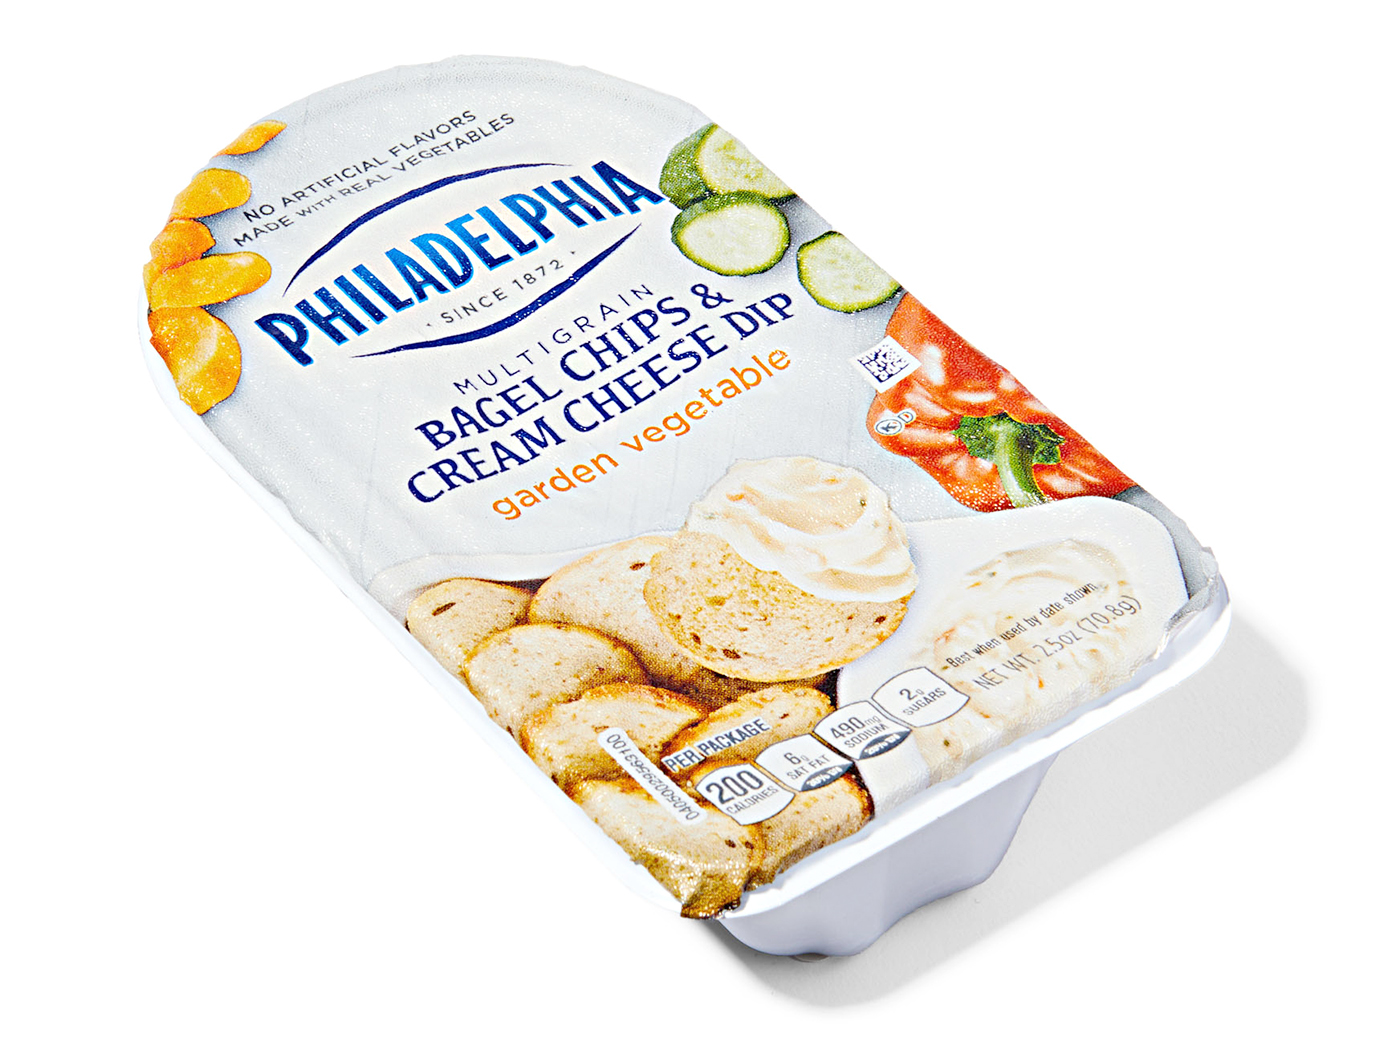 Philadelphia Garden Vegetable Bagel Chips and Cream Cheese Dip